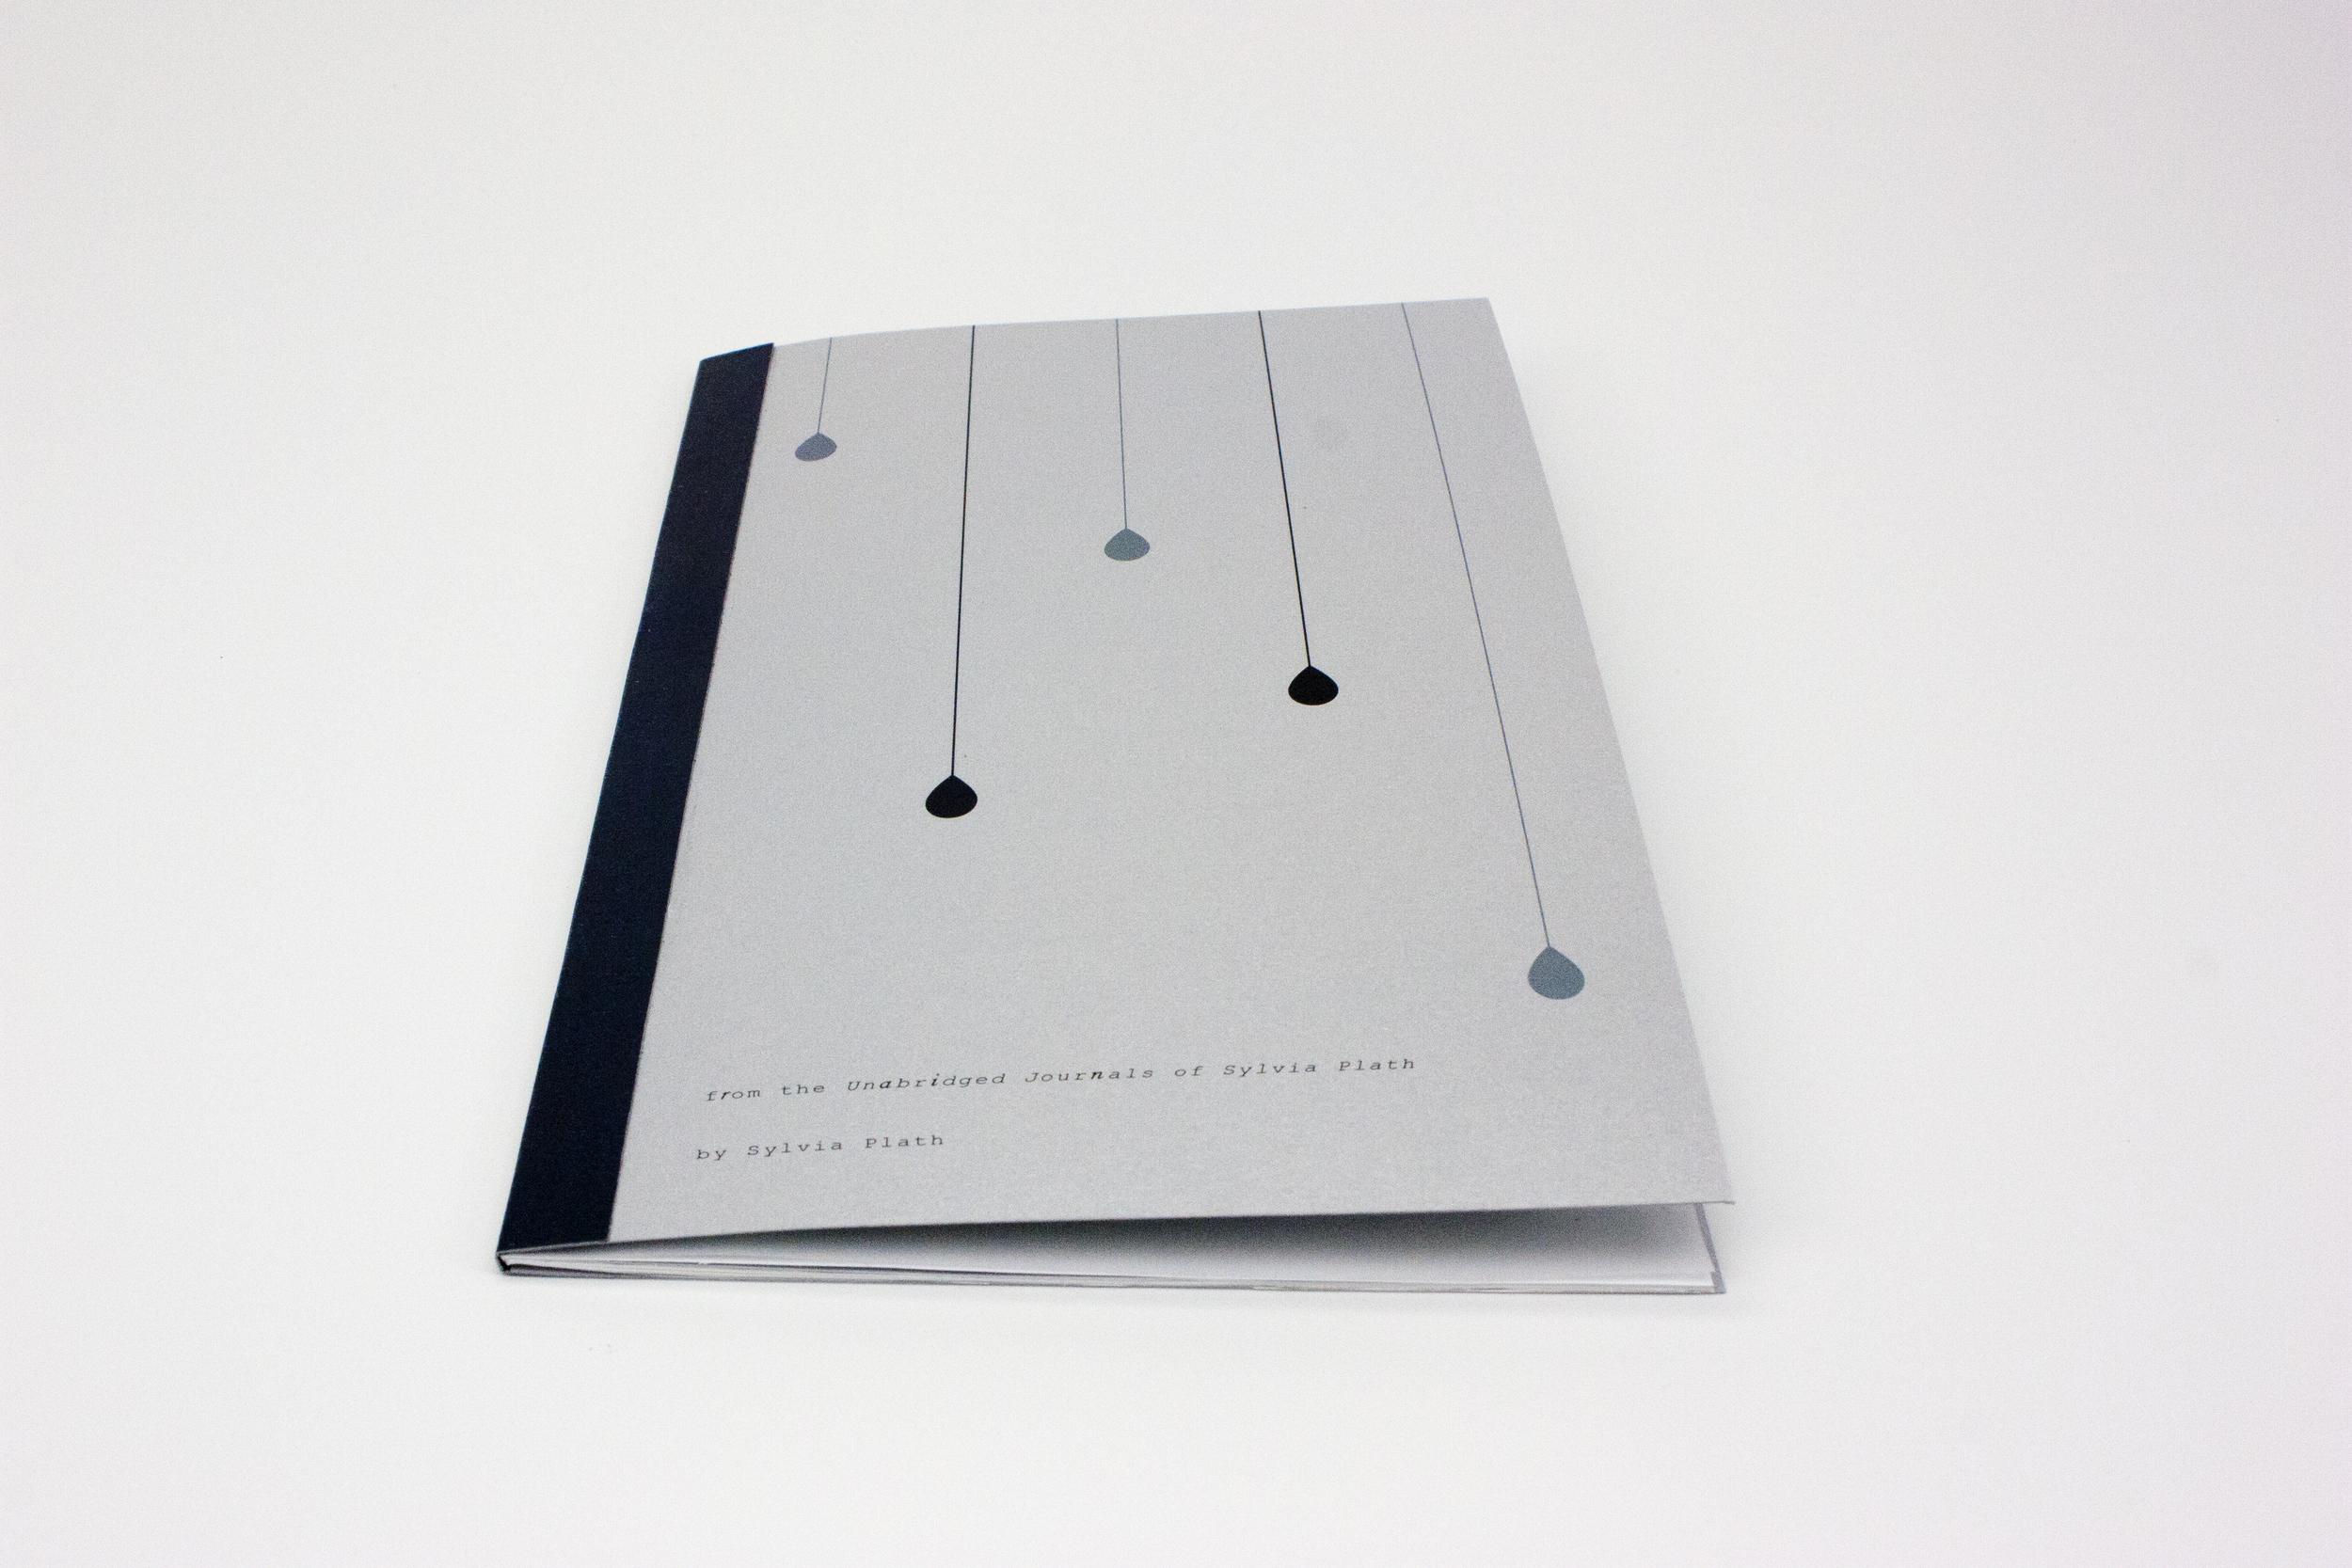 xBook_1.JPG